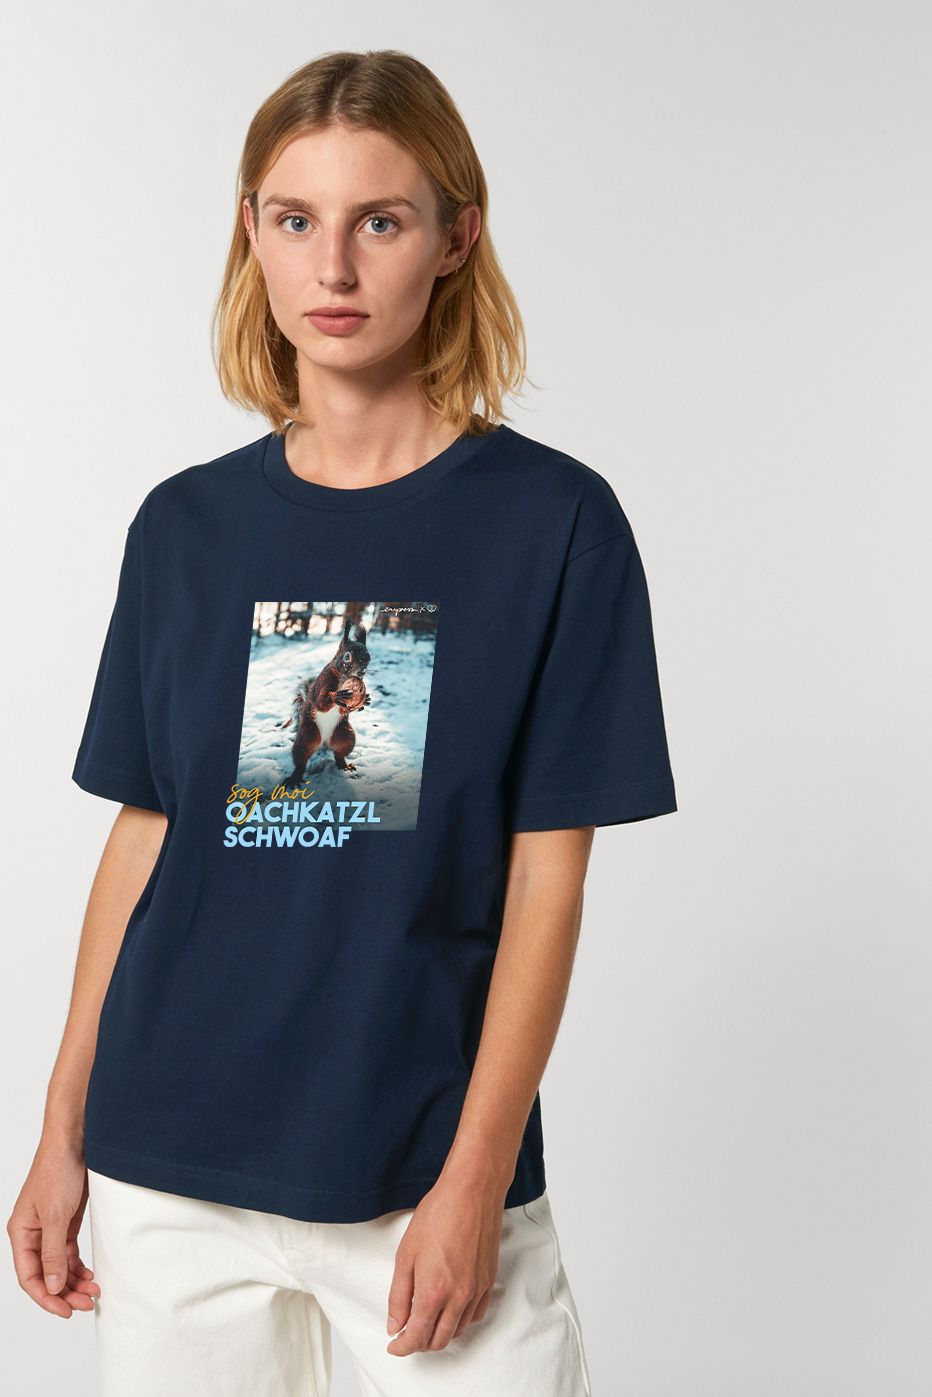 Oachkatzlschwoaf Unisex T-Shirt